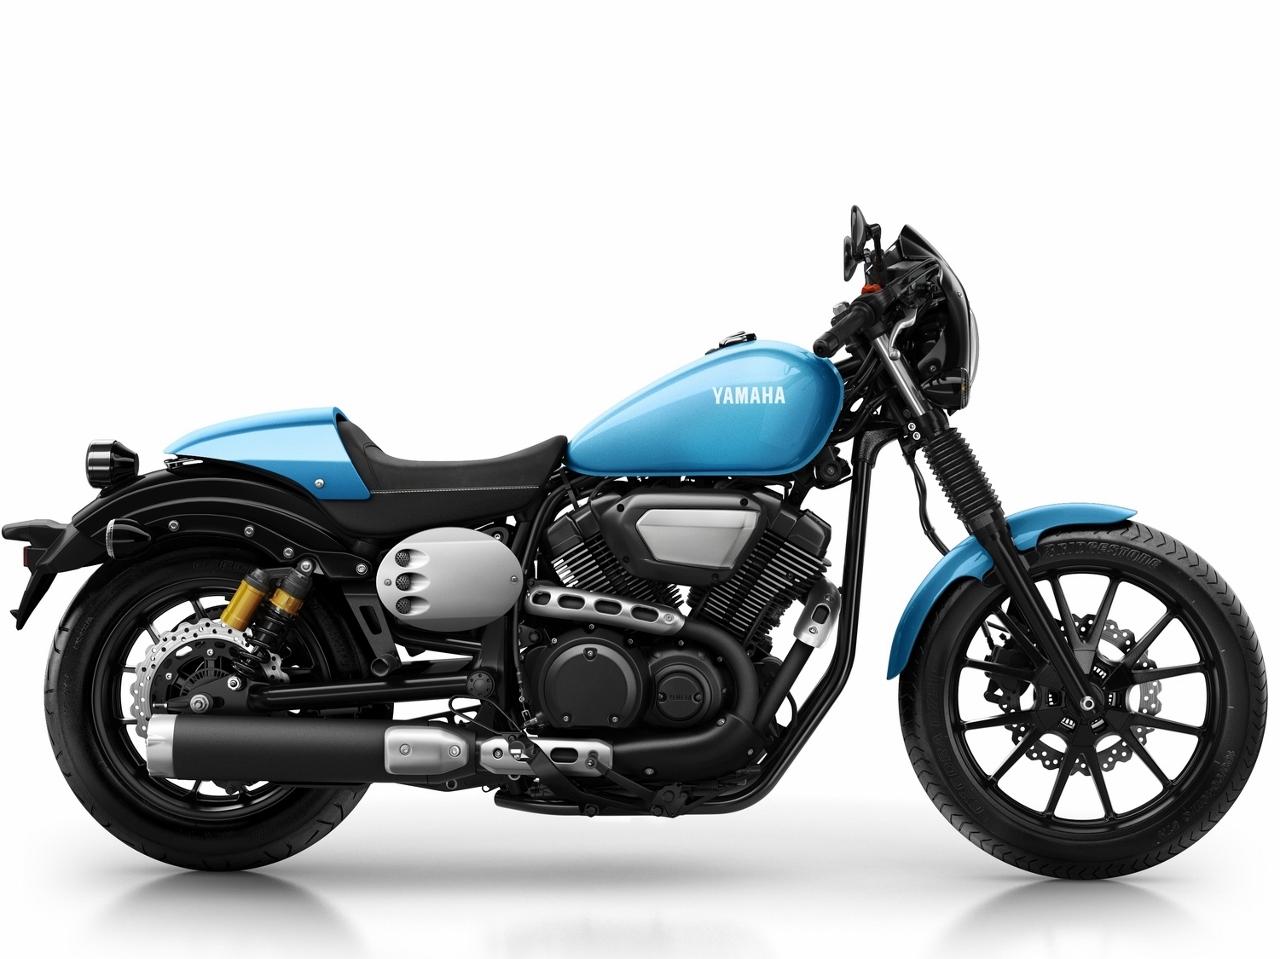 2015-Yamaha-XV950CR-EU-Glacier-Blue-Studio-002 (1280x959)